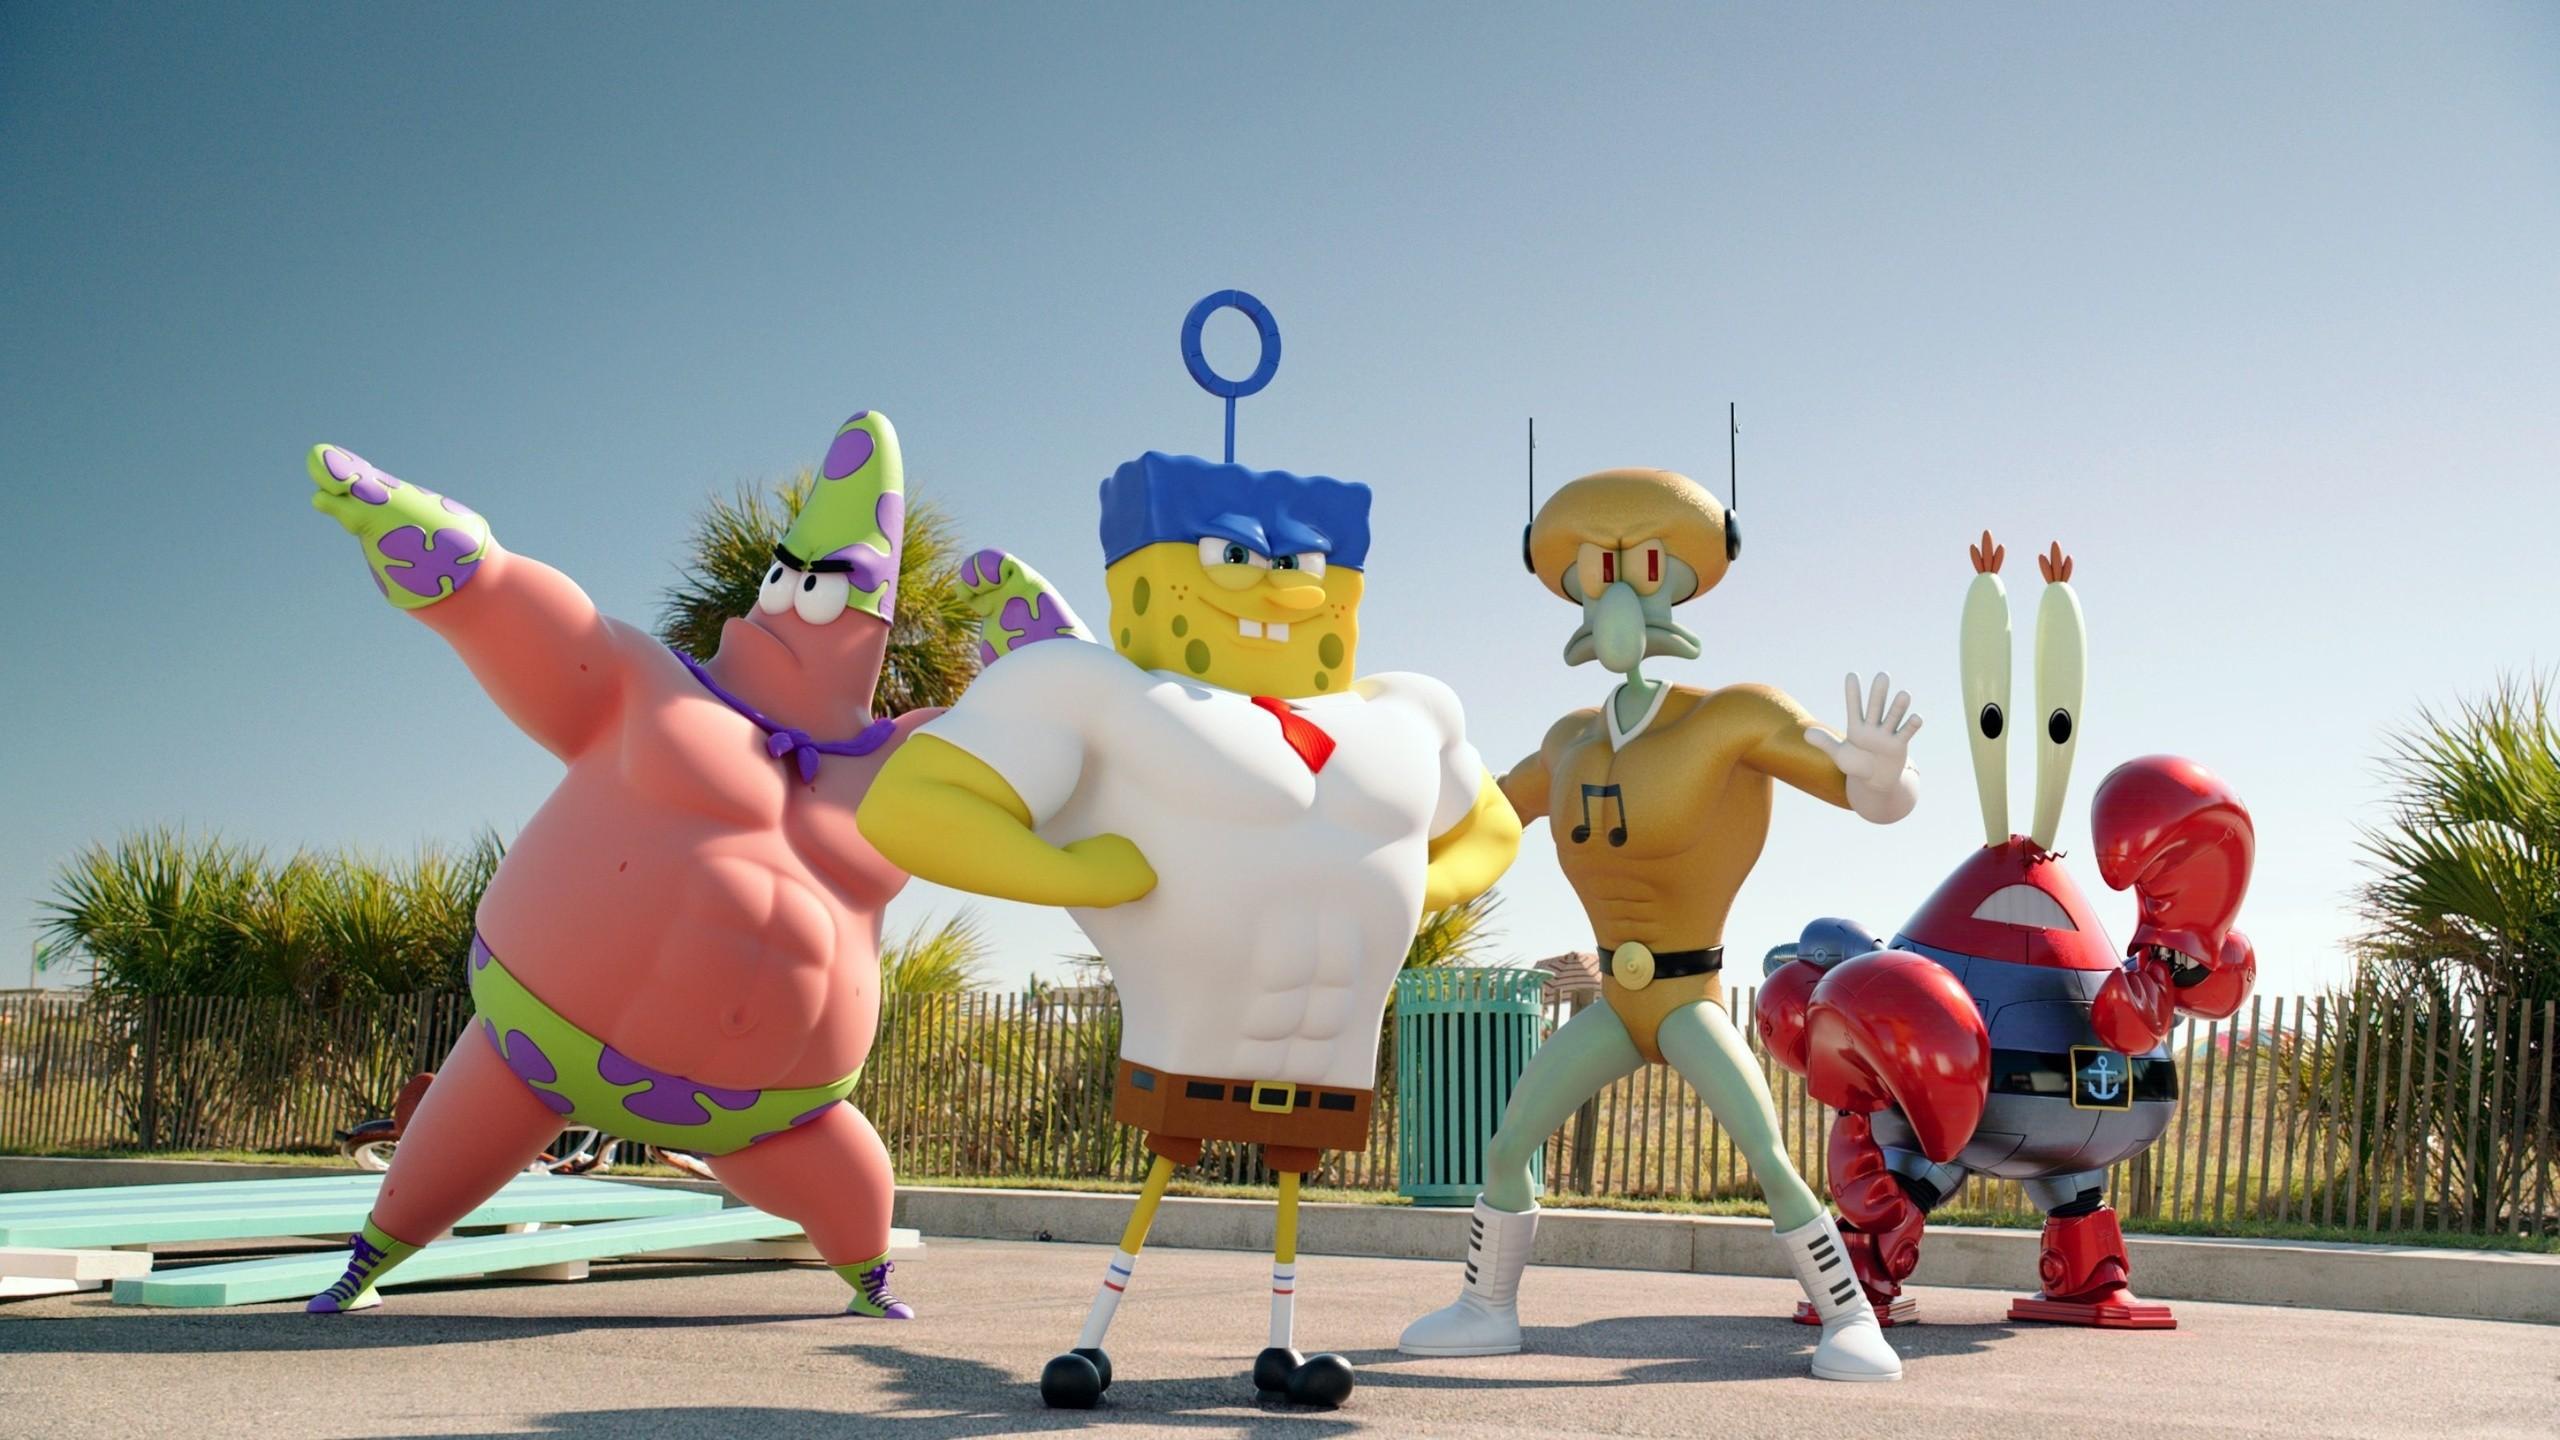 Res: 2560x1440, Patrik, Spongebob, Sponge Bob, Patrick, Squidward, Films, Mr. Krabs